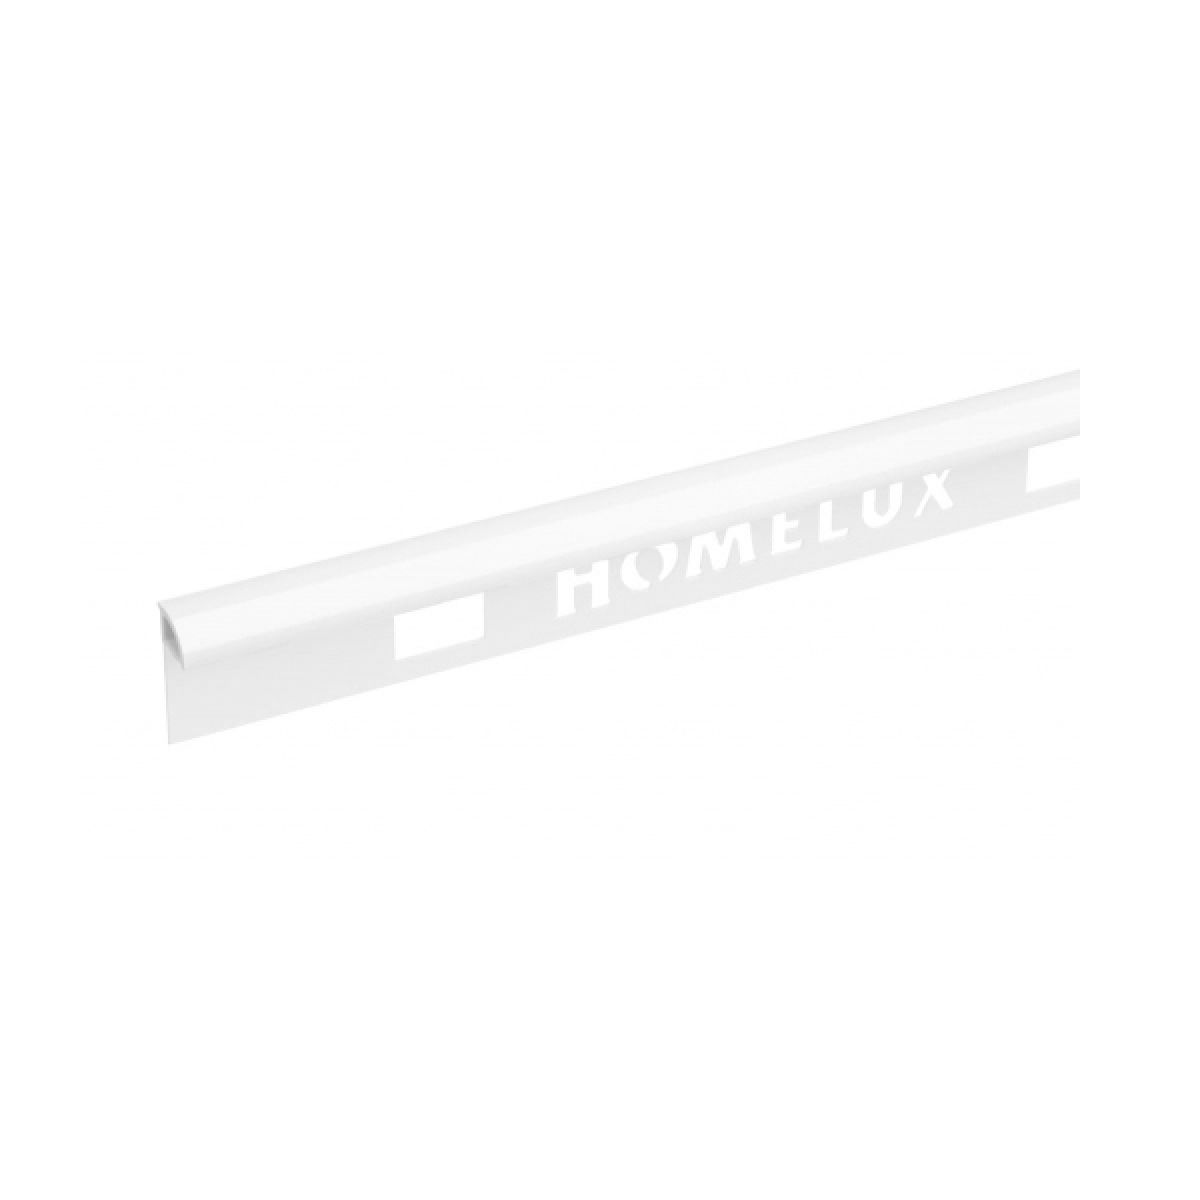 Homelux PVC Quadrant Edge 8mm Gloss White Tile Trim 2.44m